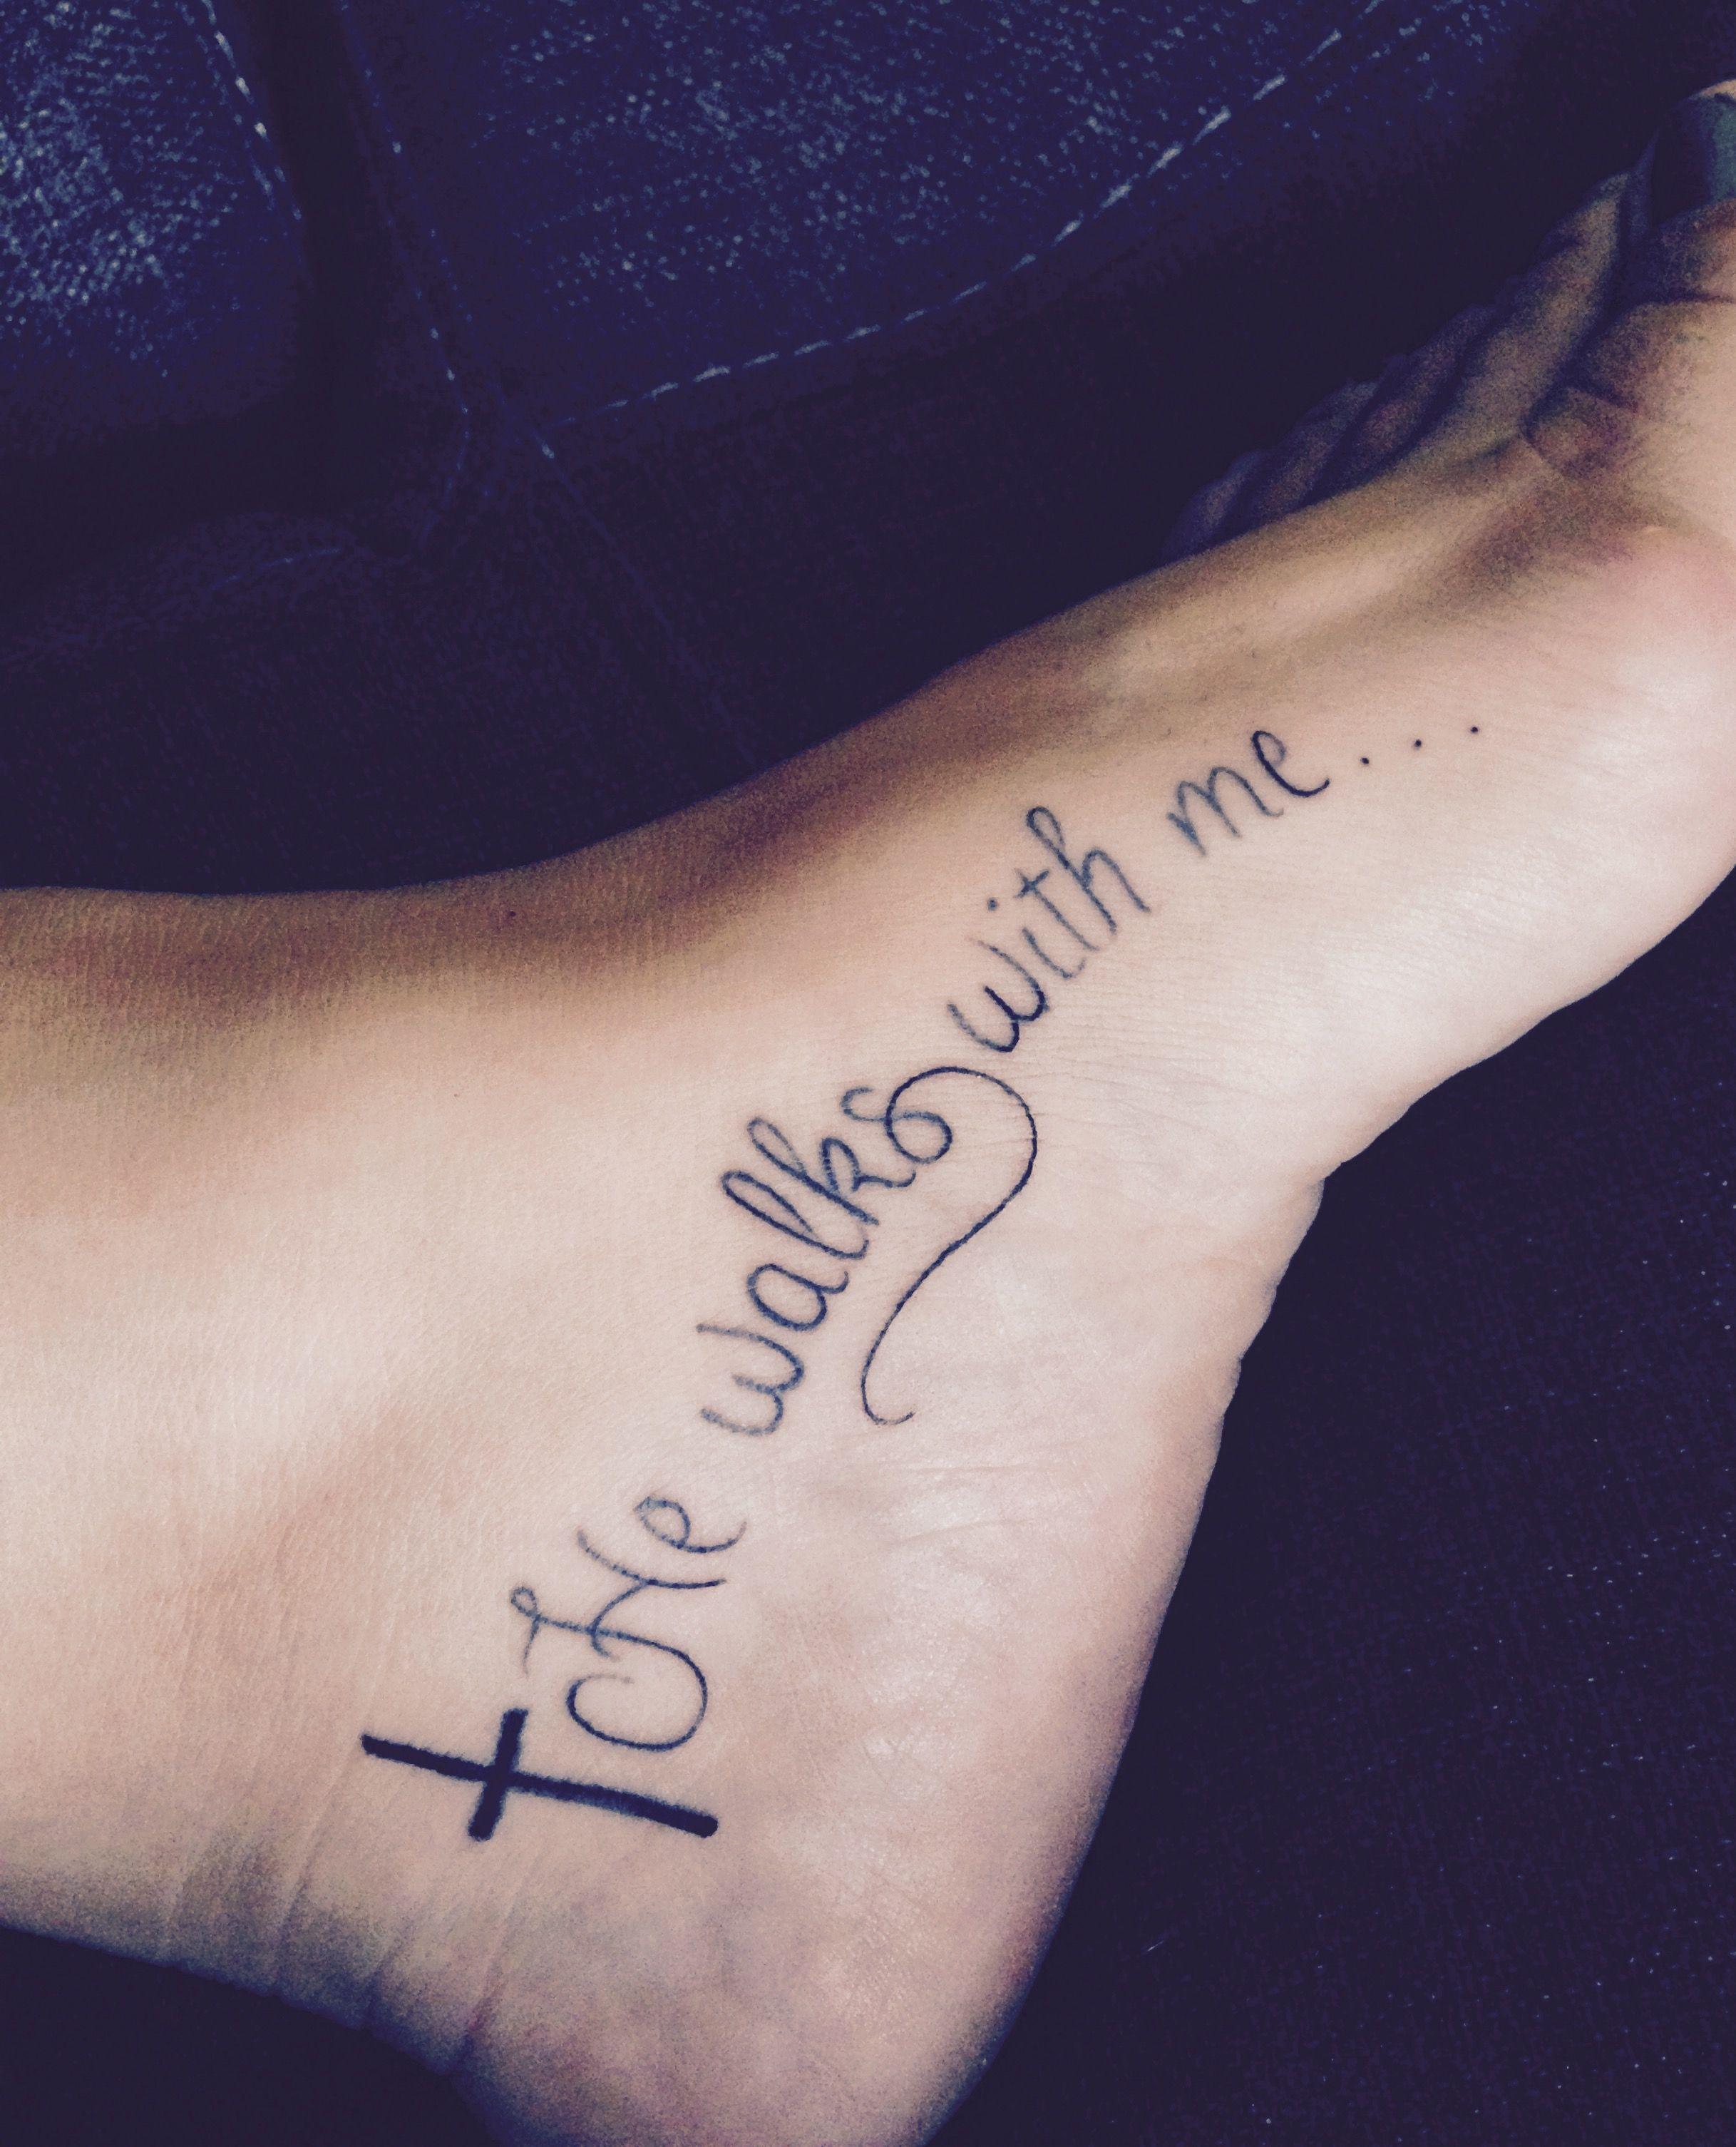 He Walks With Me Foot Tattoo My Ink Tattoos Foot Tattoos